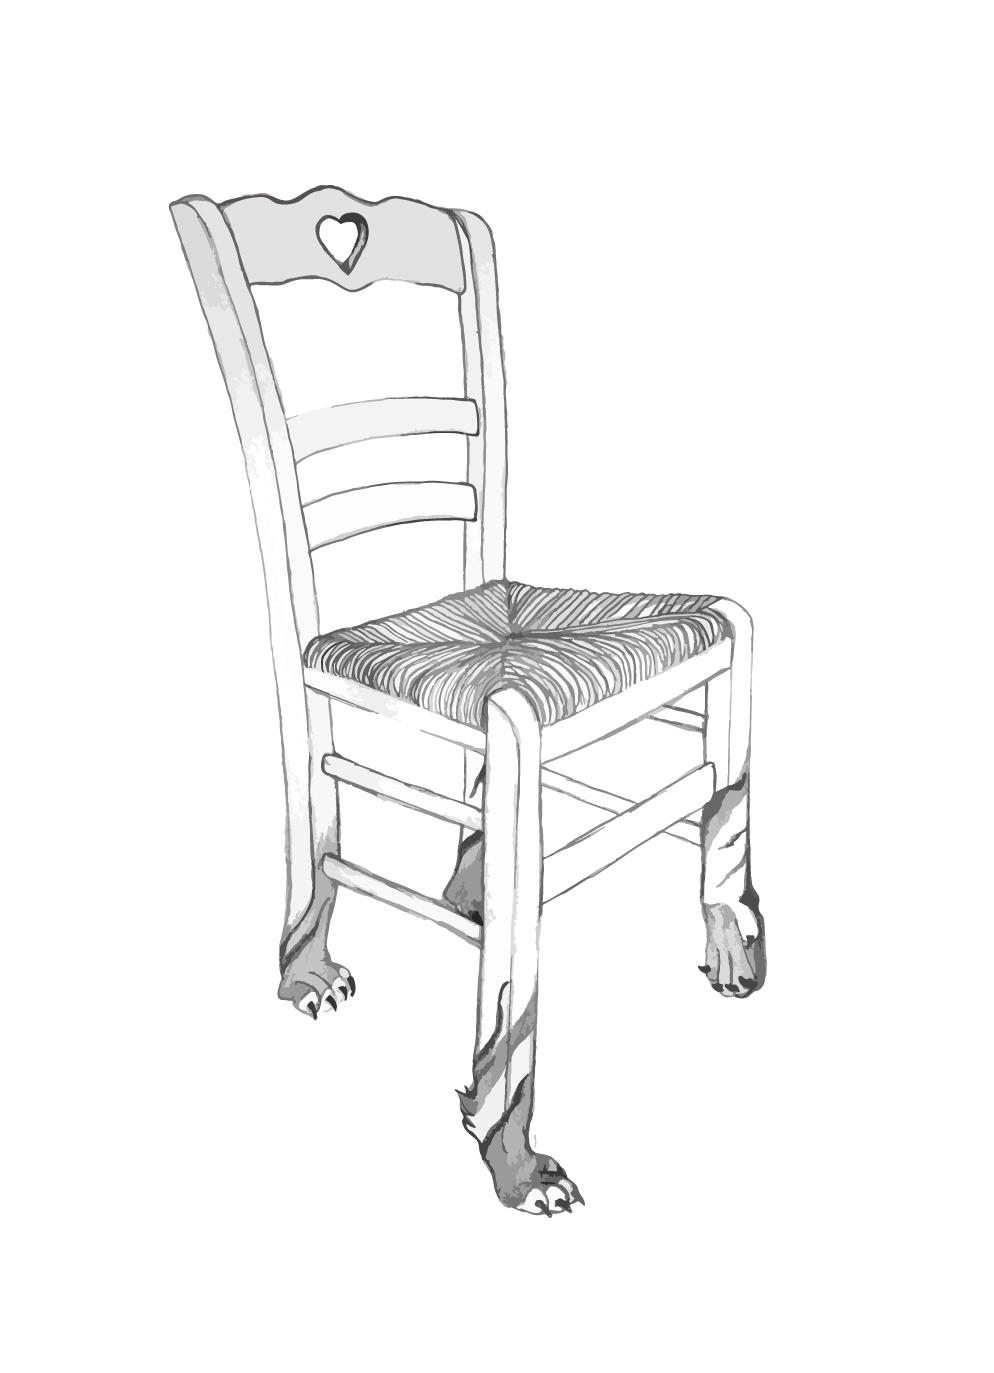 chairshavepaws-SITE.jpg